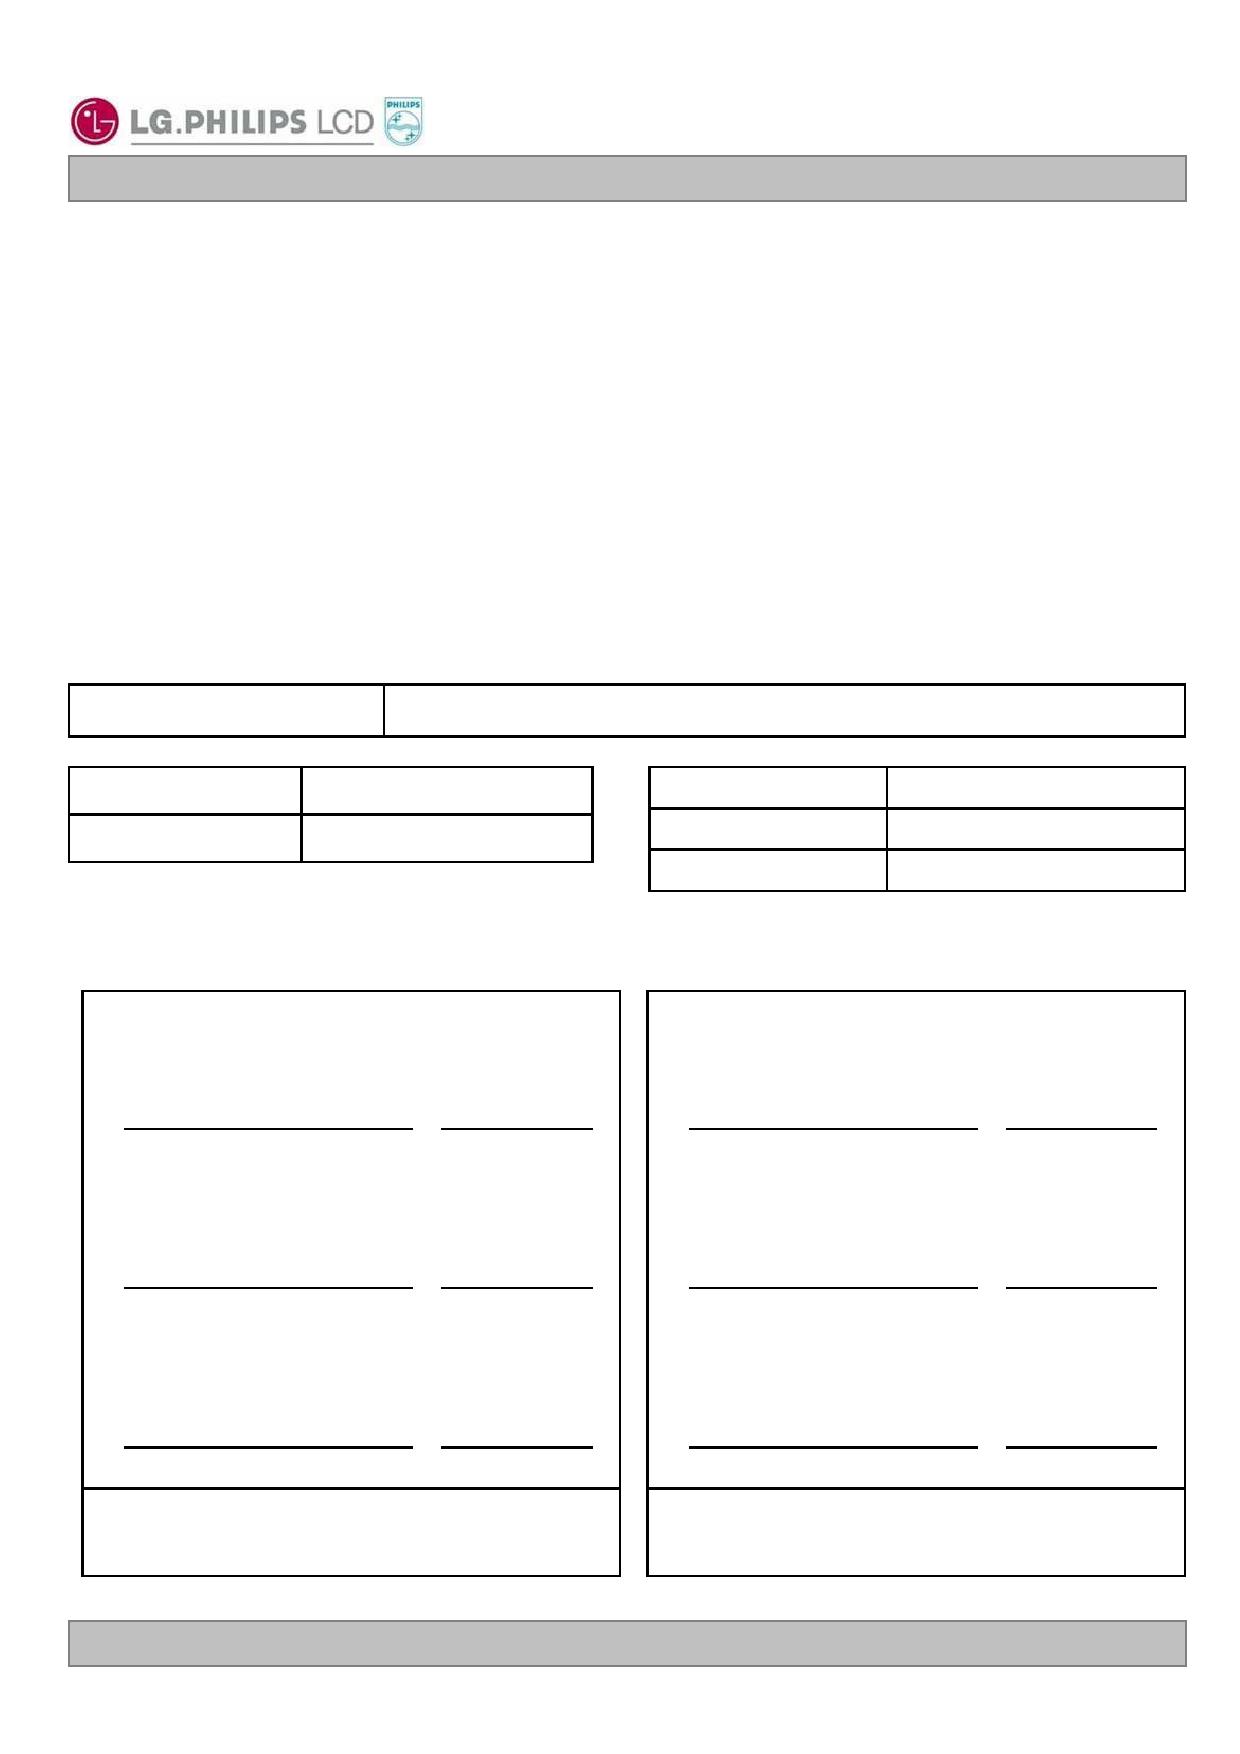 LC320W01-A4 datasheet